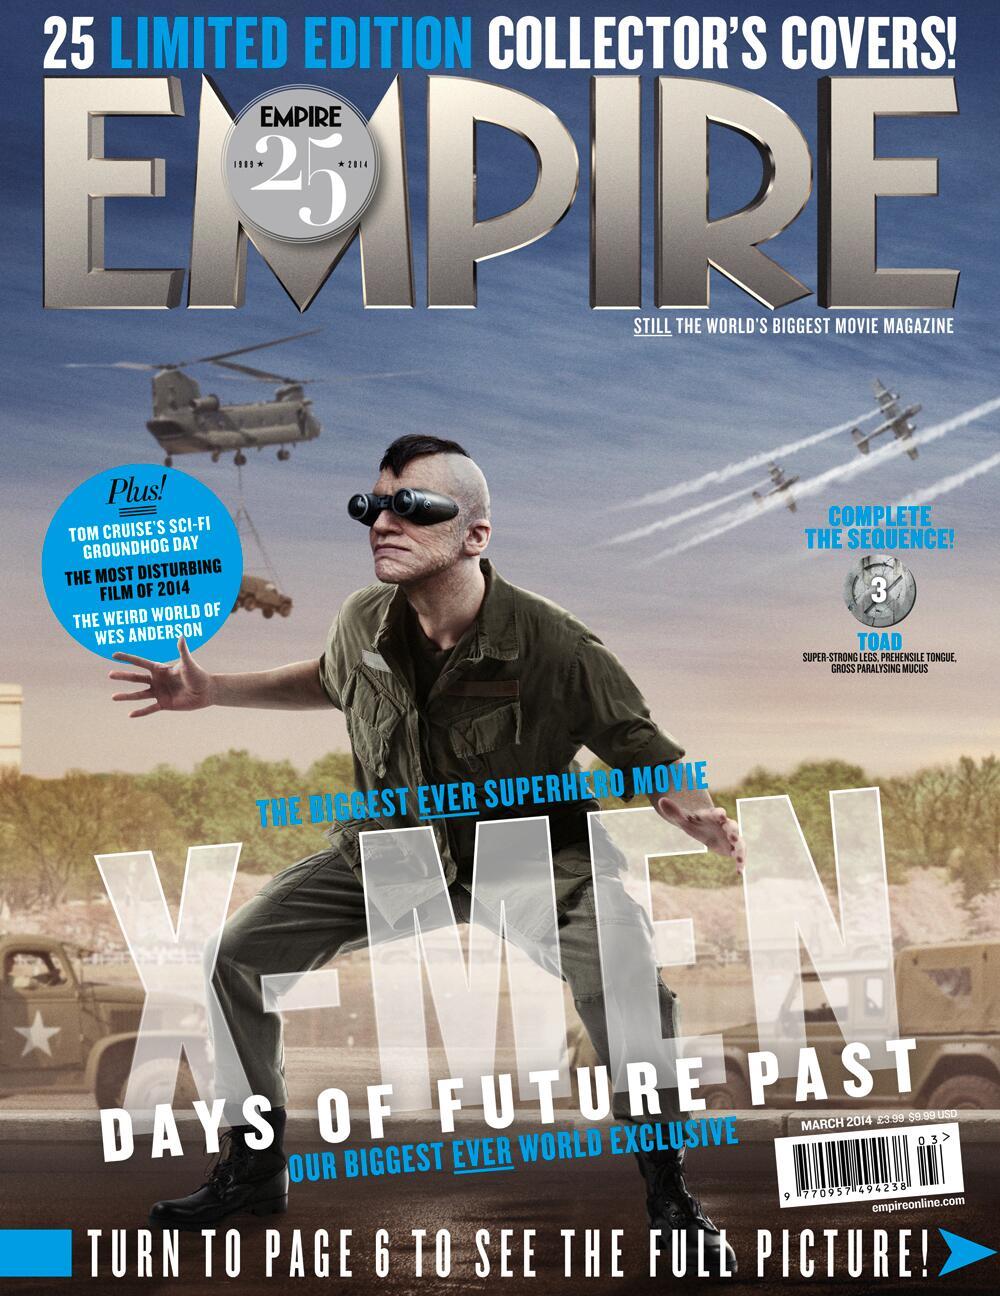 RT @20thCFoxSp: Apareció en #XMen en el 2000, Sapo vuelve al reparto, ahora es Evan Jonigkeit (@Johnakite). #Empire25 http://t.co/rqXkKgiX0k